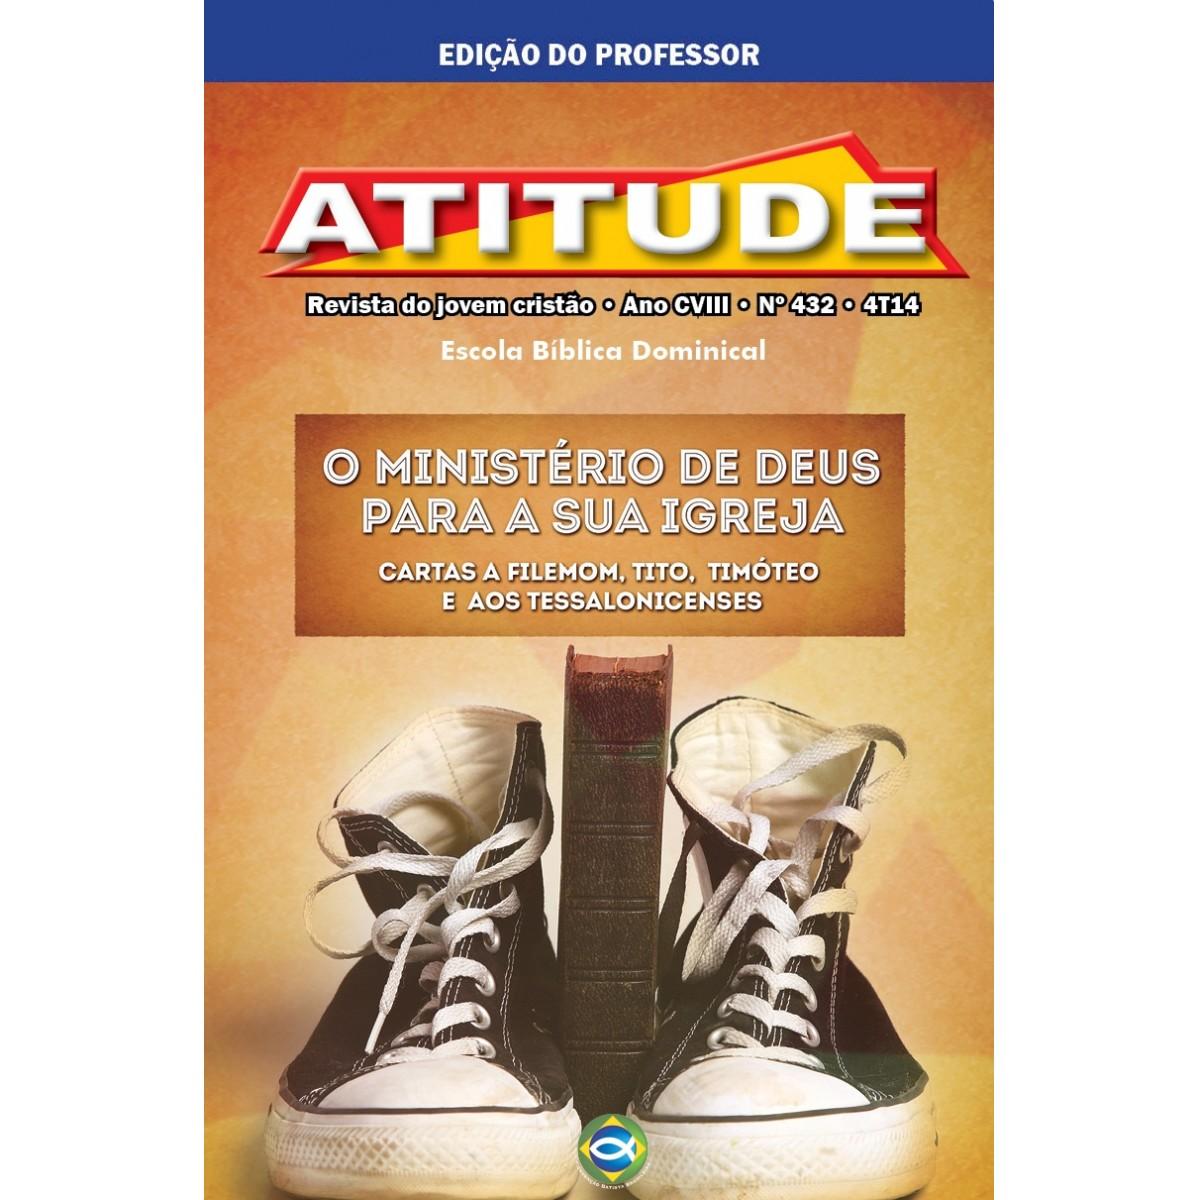 Atitude (Professor) - 4º Trimestre 2014  - Distribuidora EBD